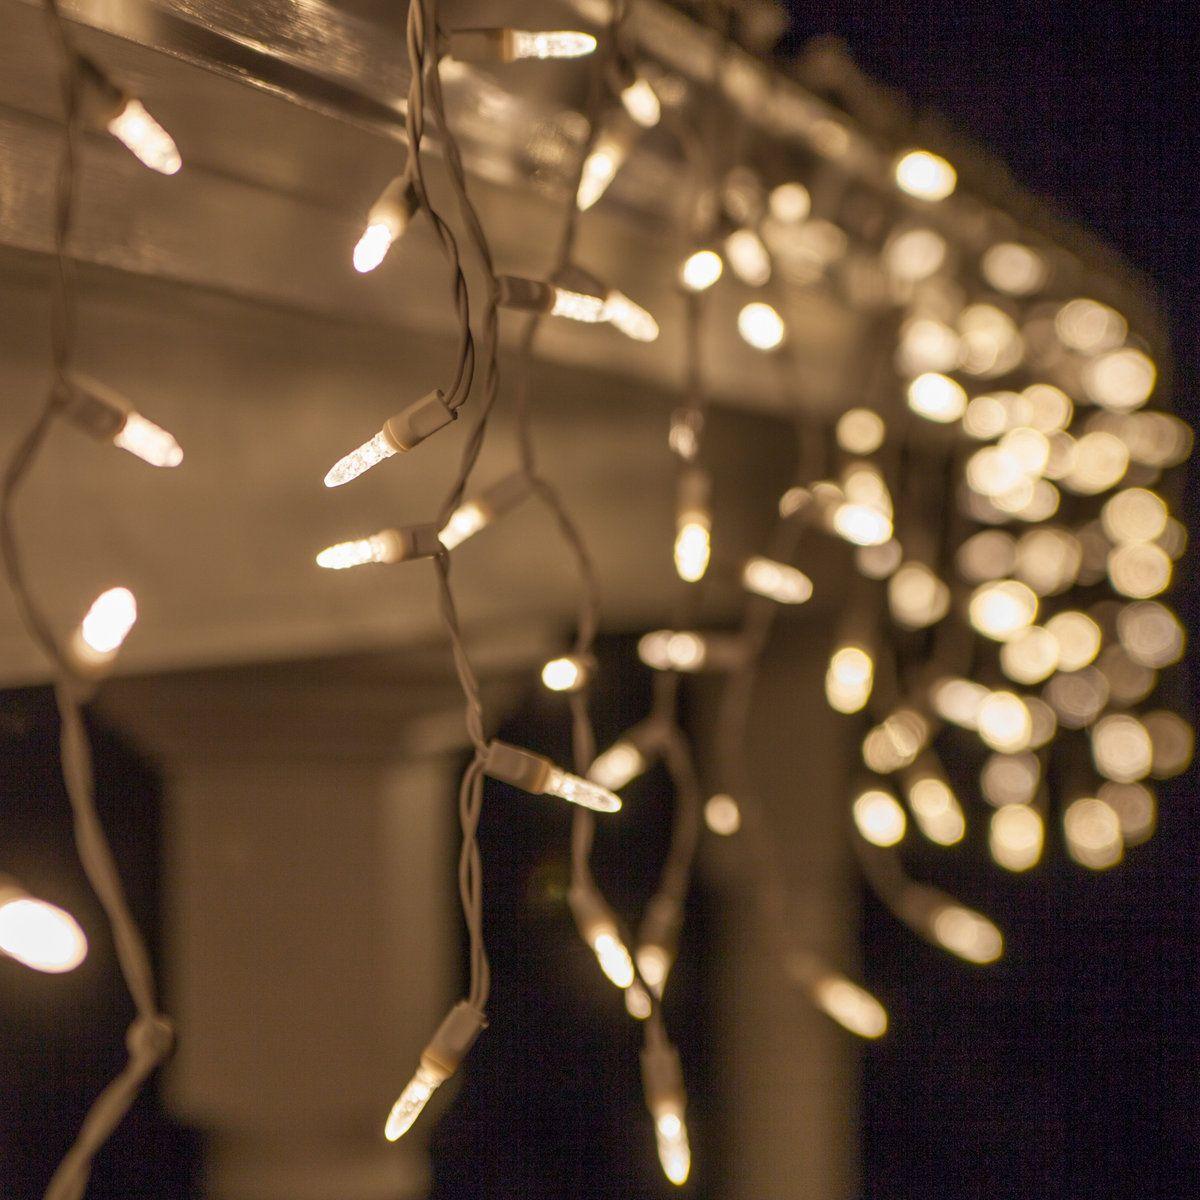 White icicle lights for christmas hang across the roof porch or white icicle lights for christmas hang across the roof porch or fence plus aloadofball Image collections